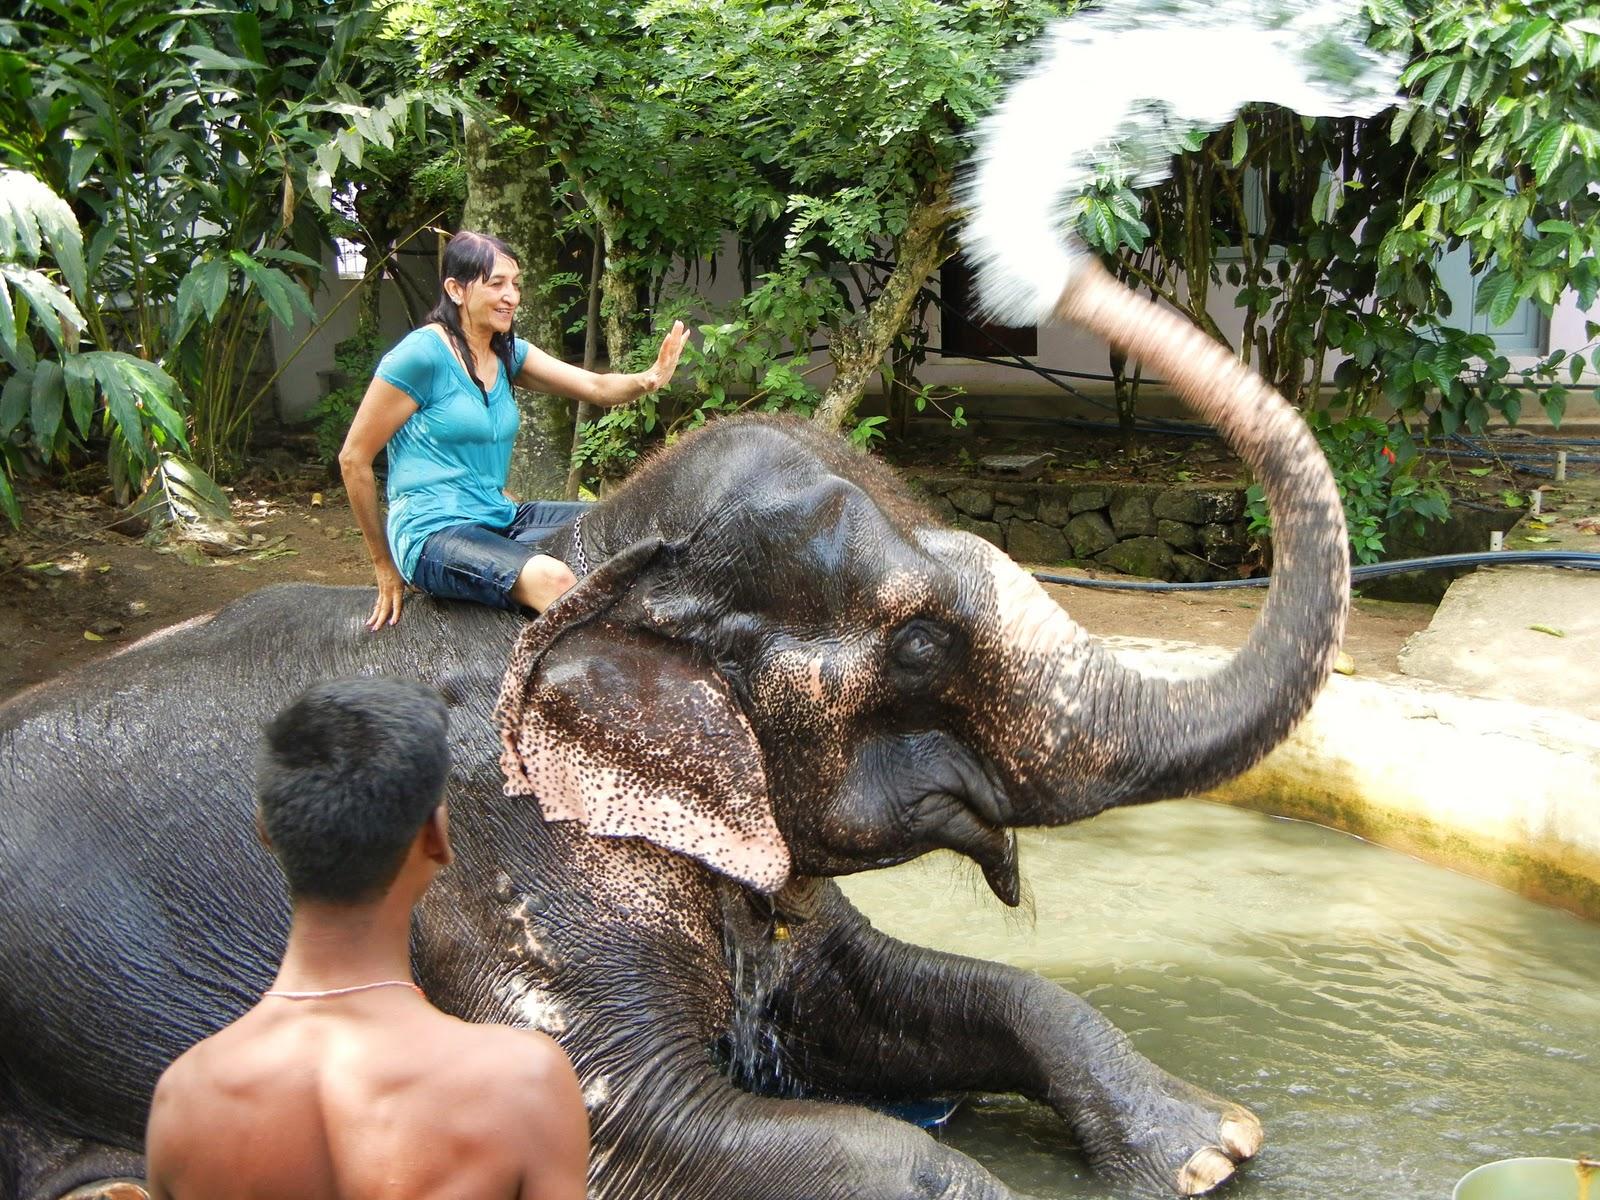 SalMer: Kerala - Thekkady, Kumarkom, Kovalam